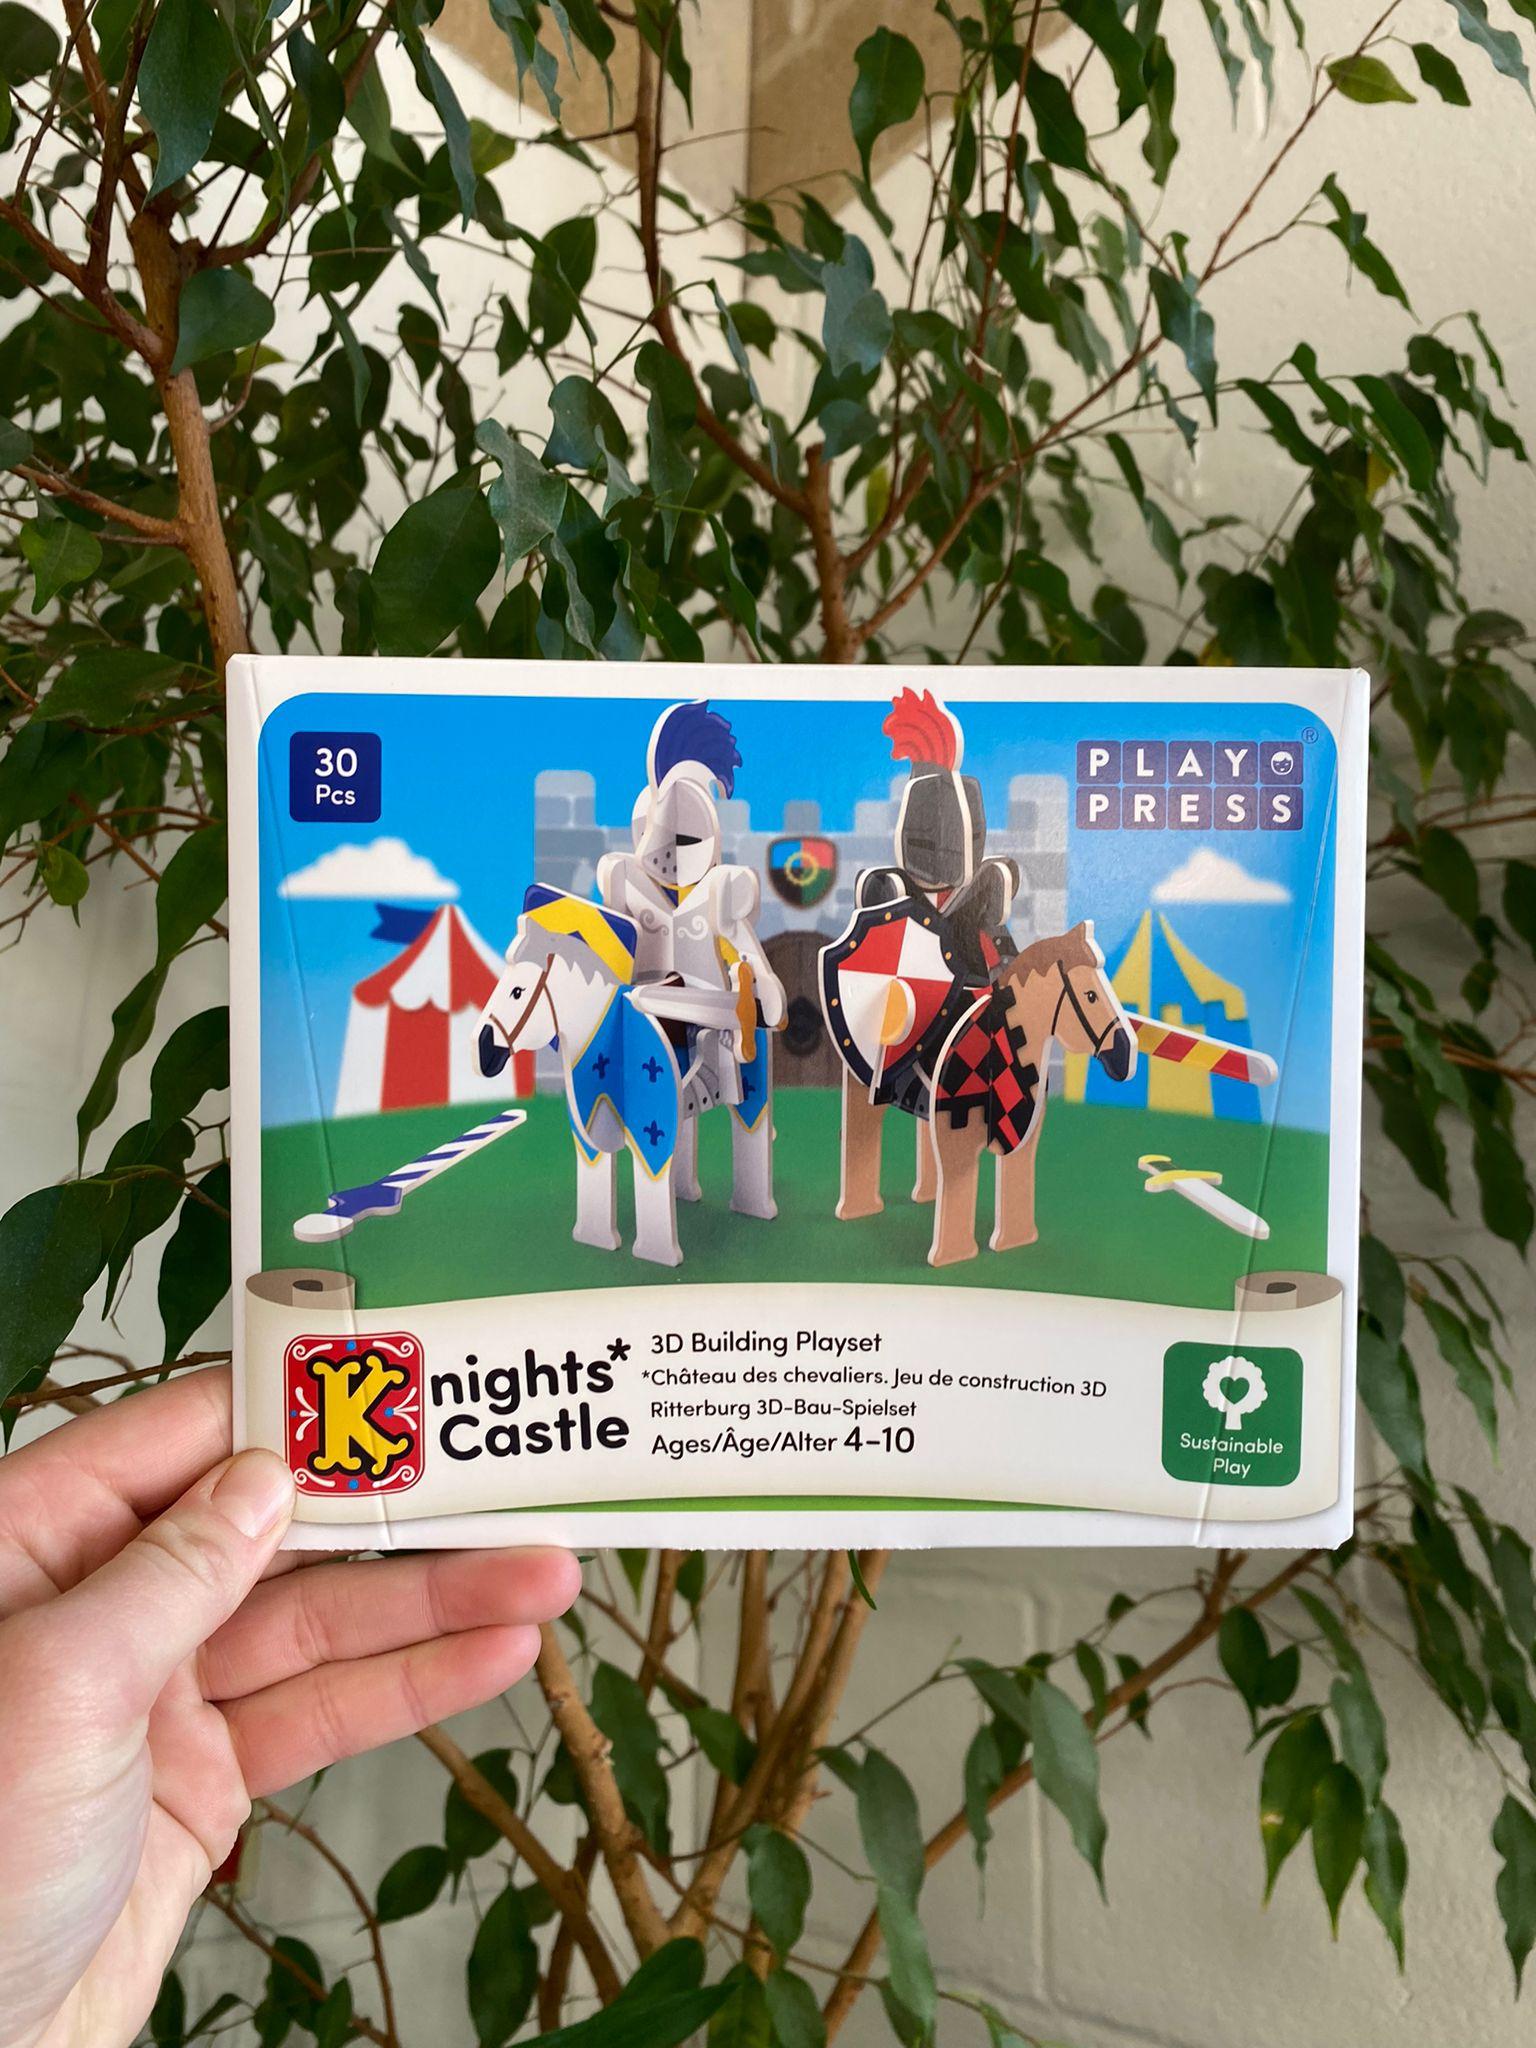 Knights Castle   Playpress